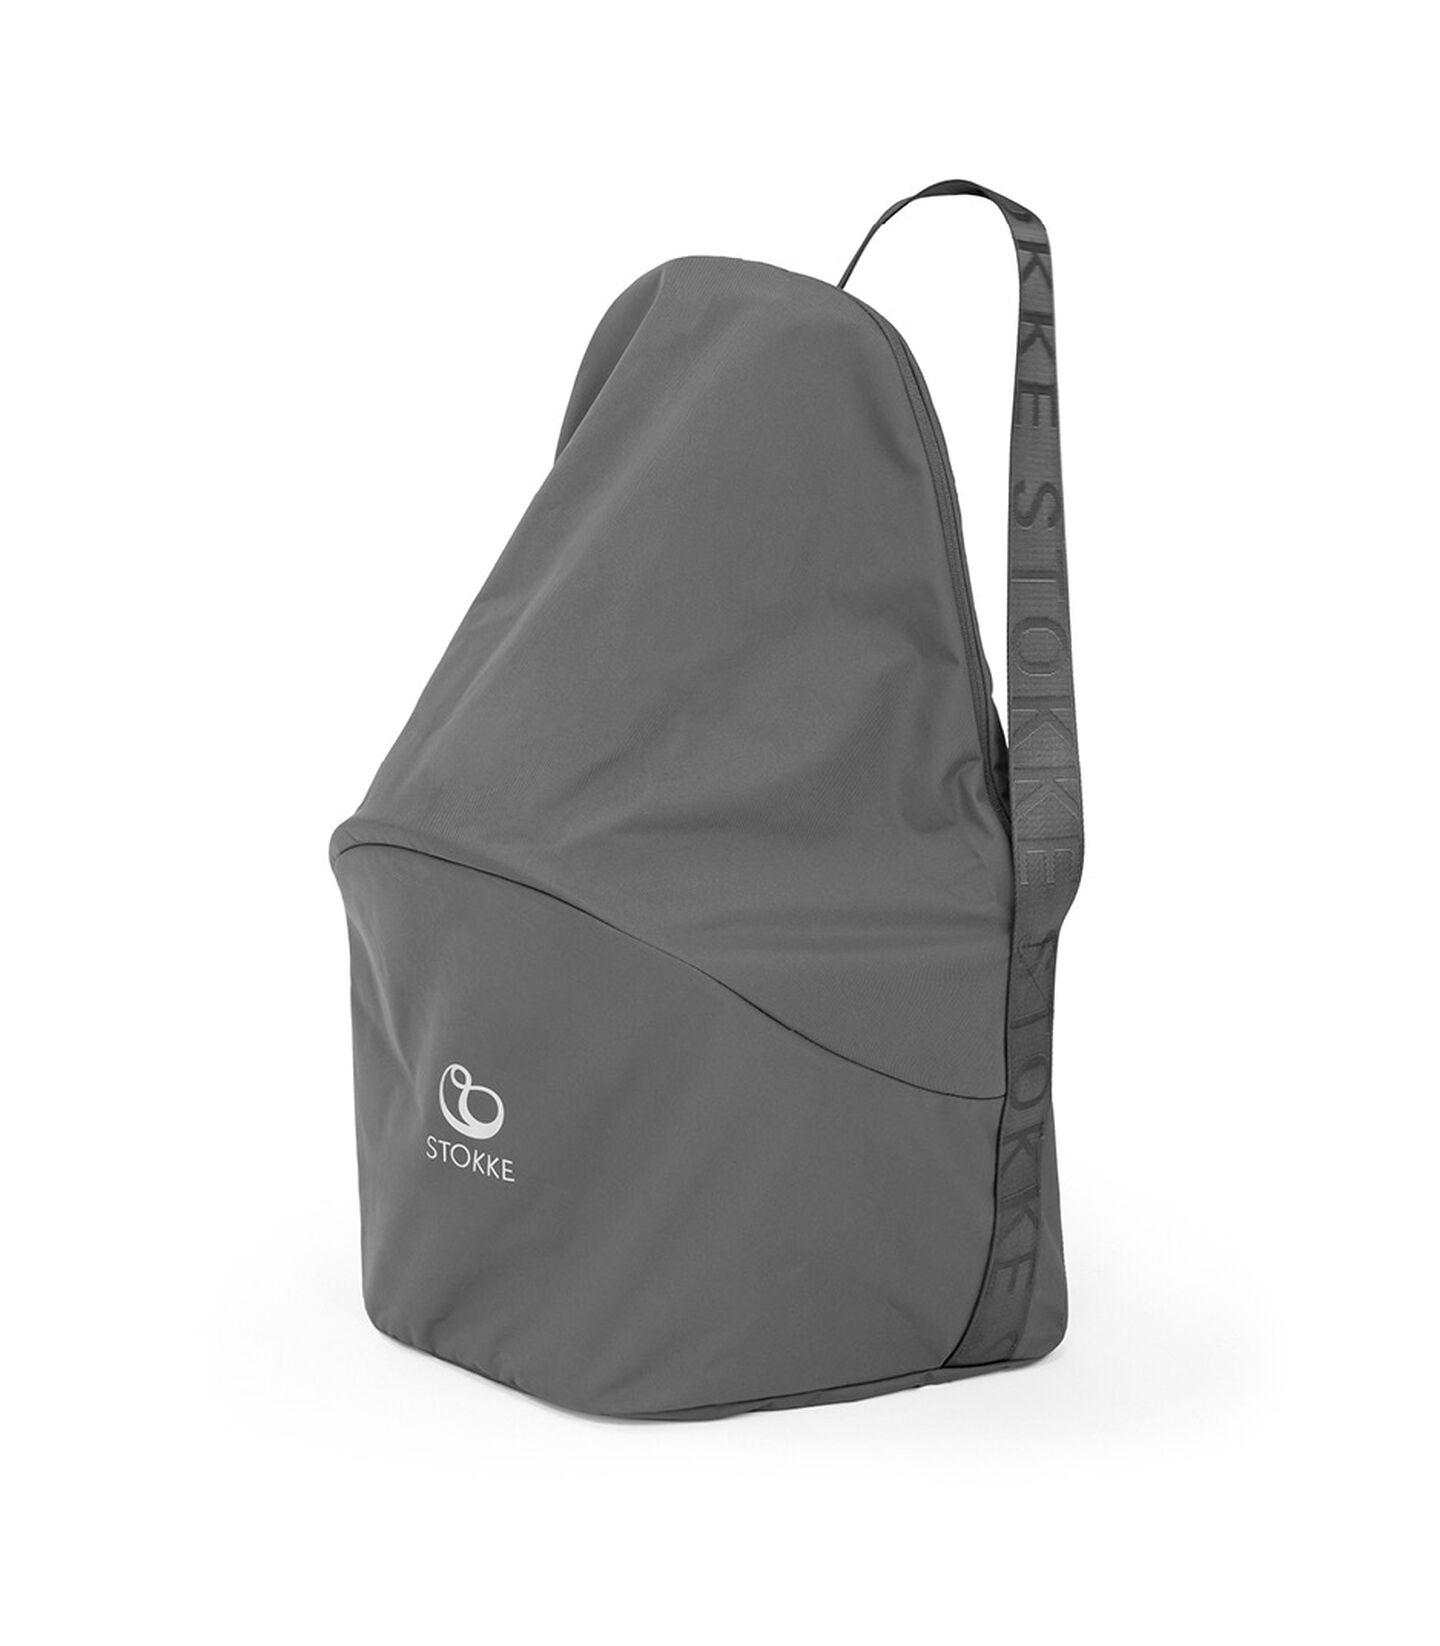 Stokke® Clikk™ Travel Bag Dark Grey, Dark Grey, mainview view 1